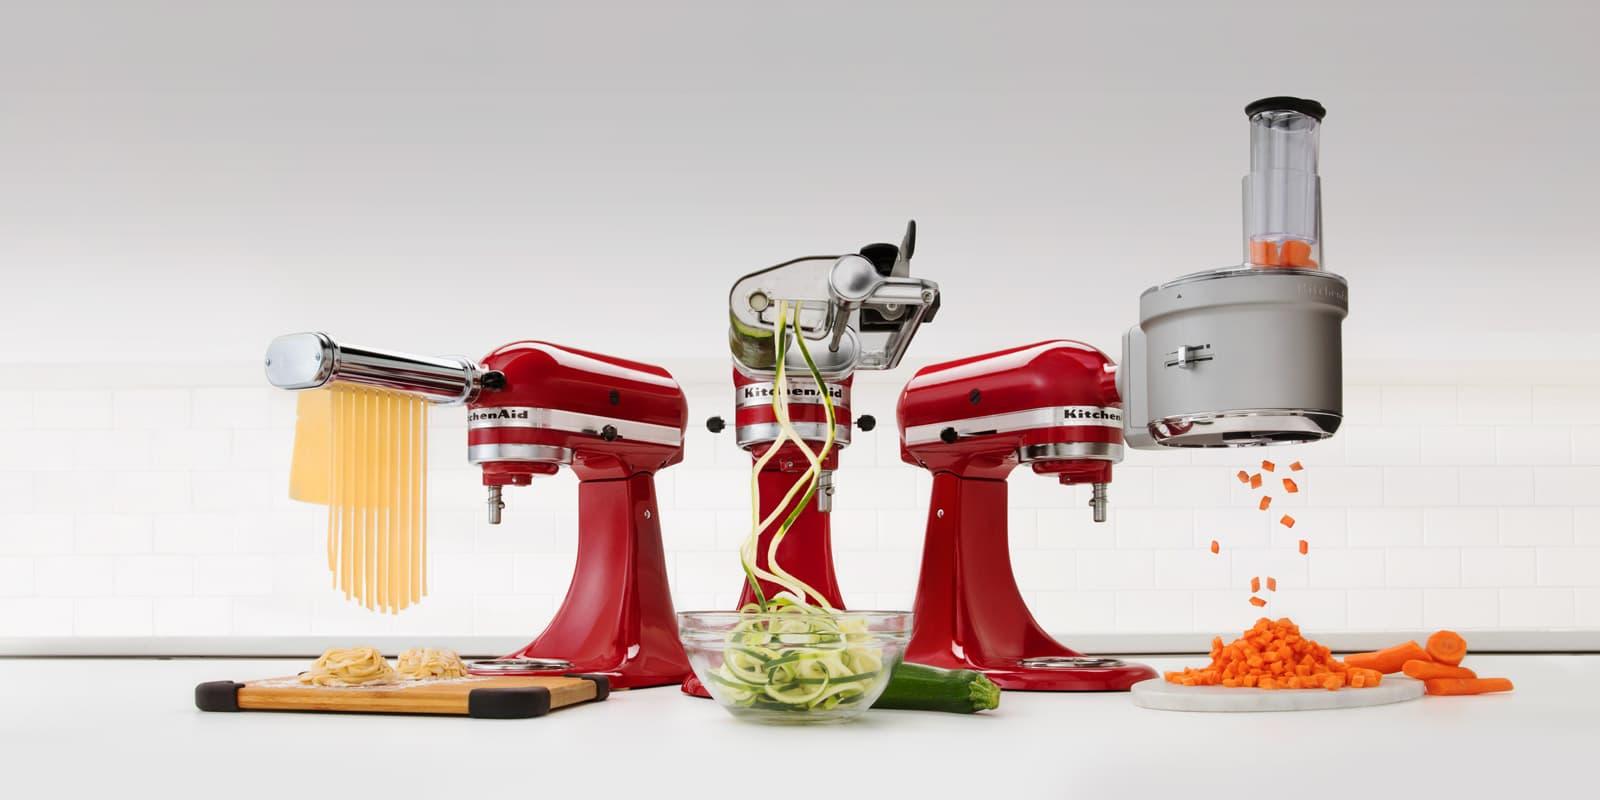 Robot da cucina ARTISAN da 6,9 L 5KSM7580X | Sito Ufficiale KitchenAid